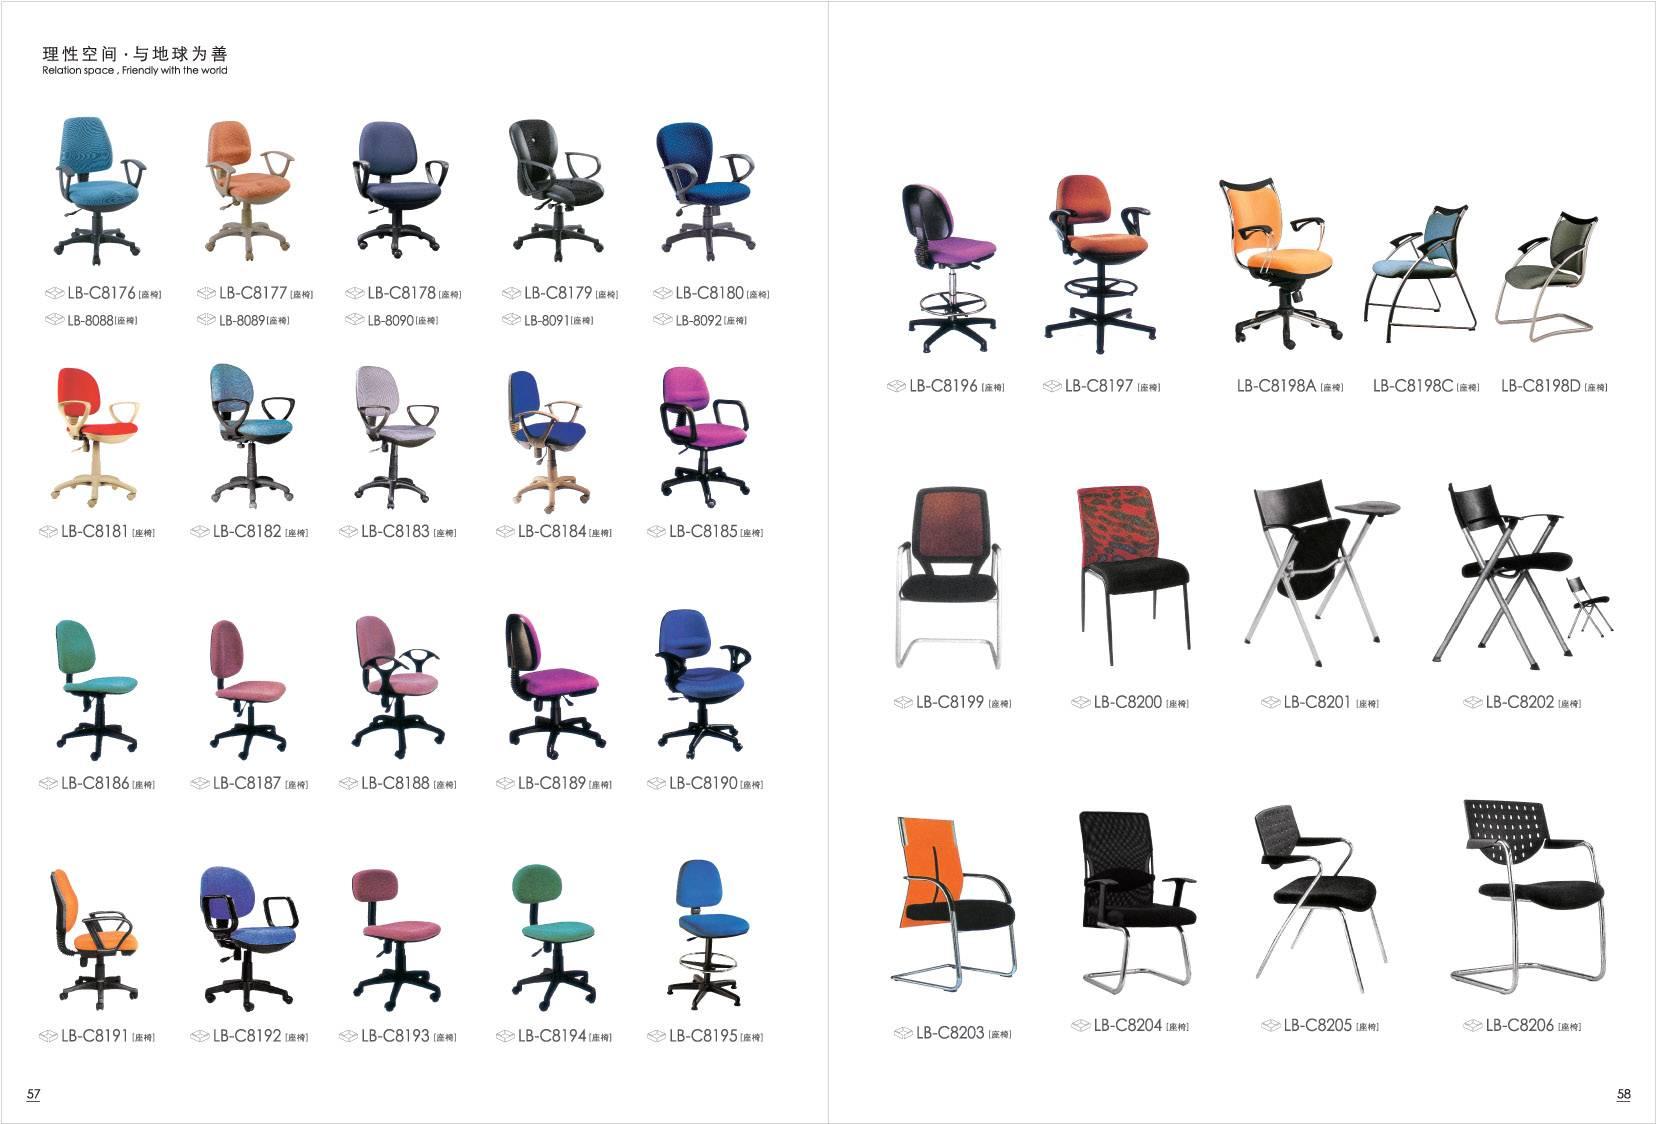 swivel chair cheapest price